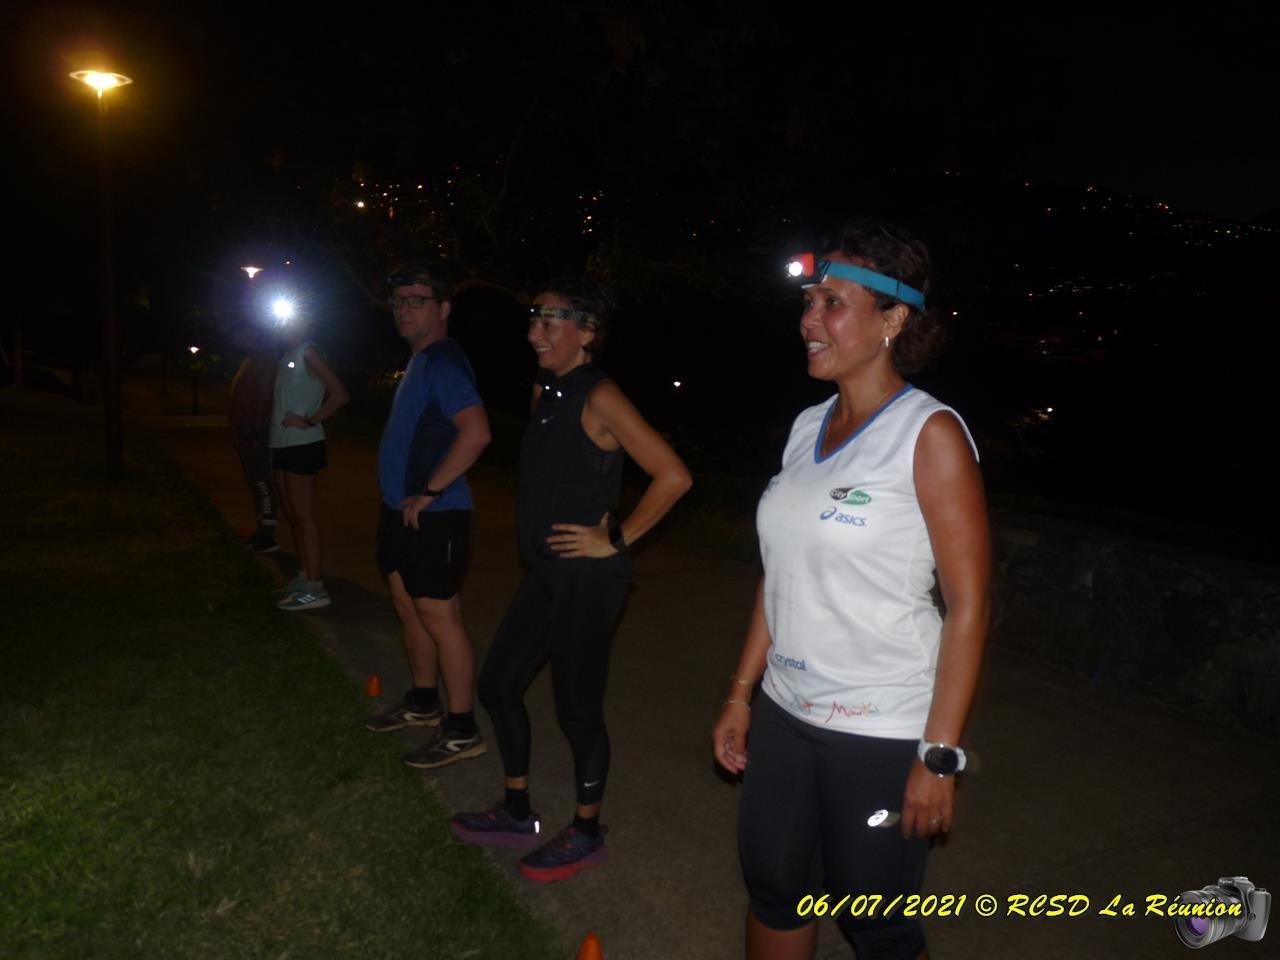 20210706 Entrain Trail Trinité 002